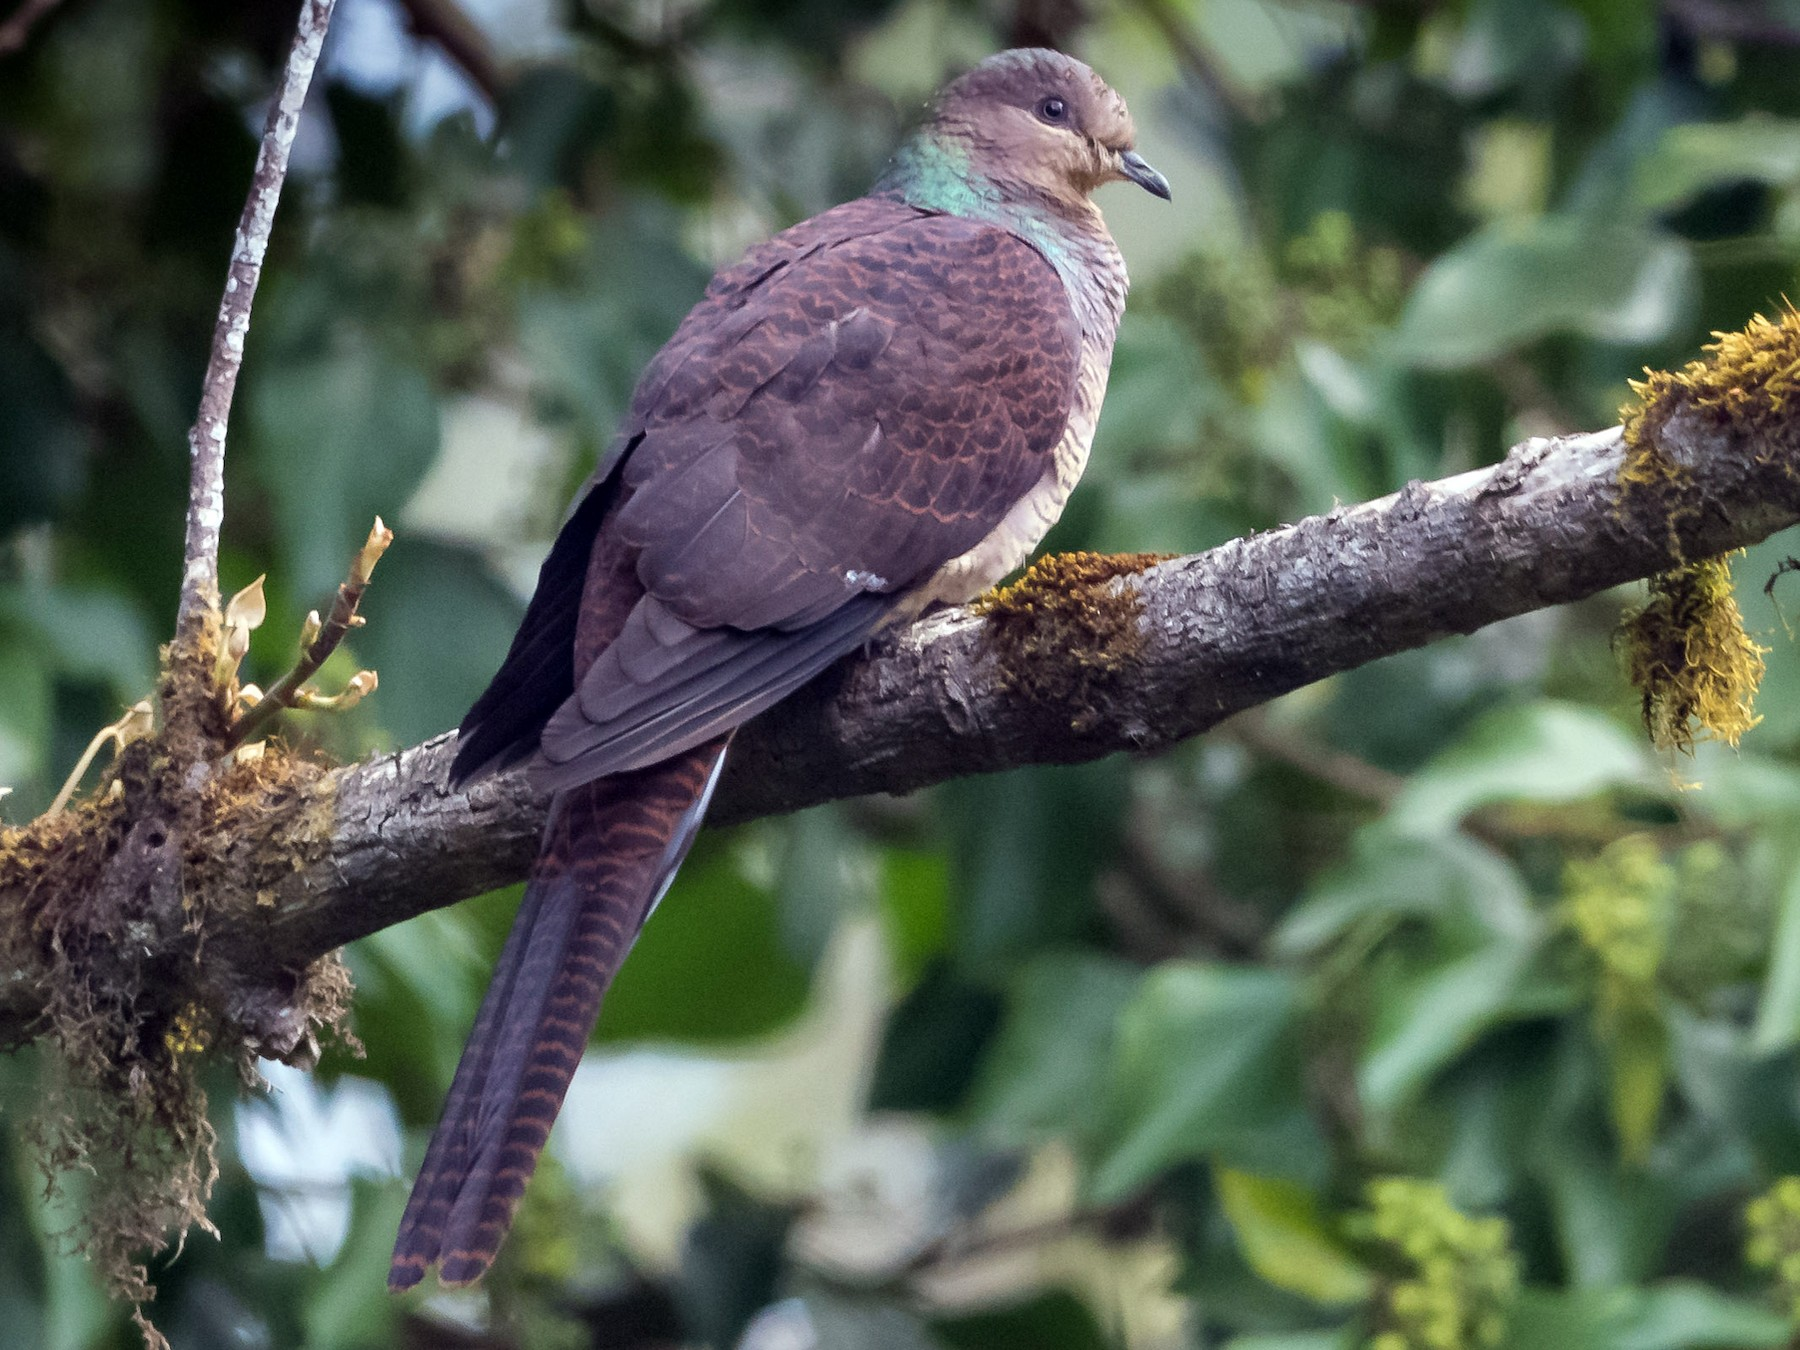 Barred Cuckoo-Dove - Prashant Tewari